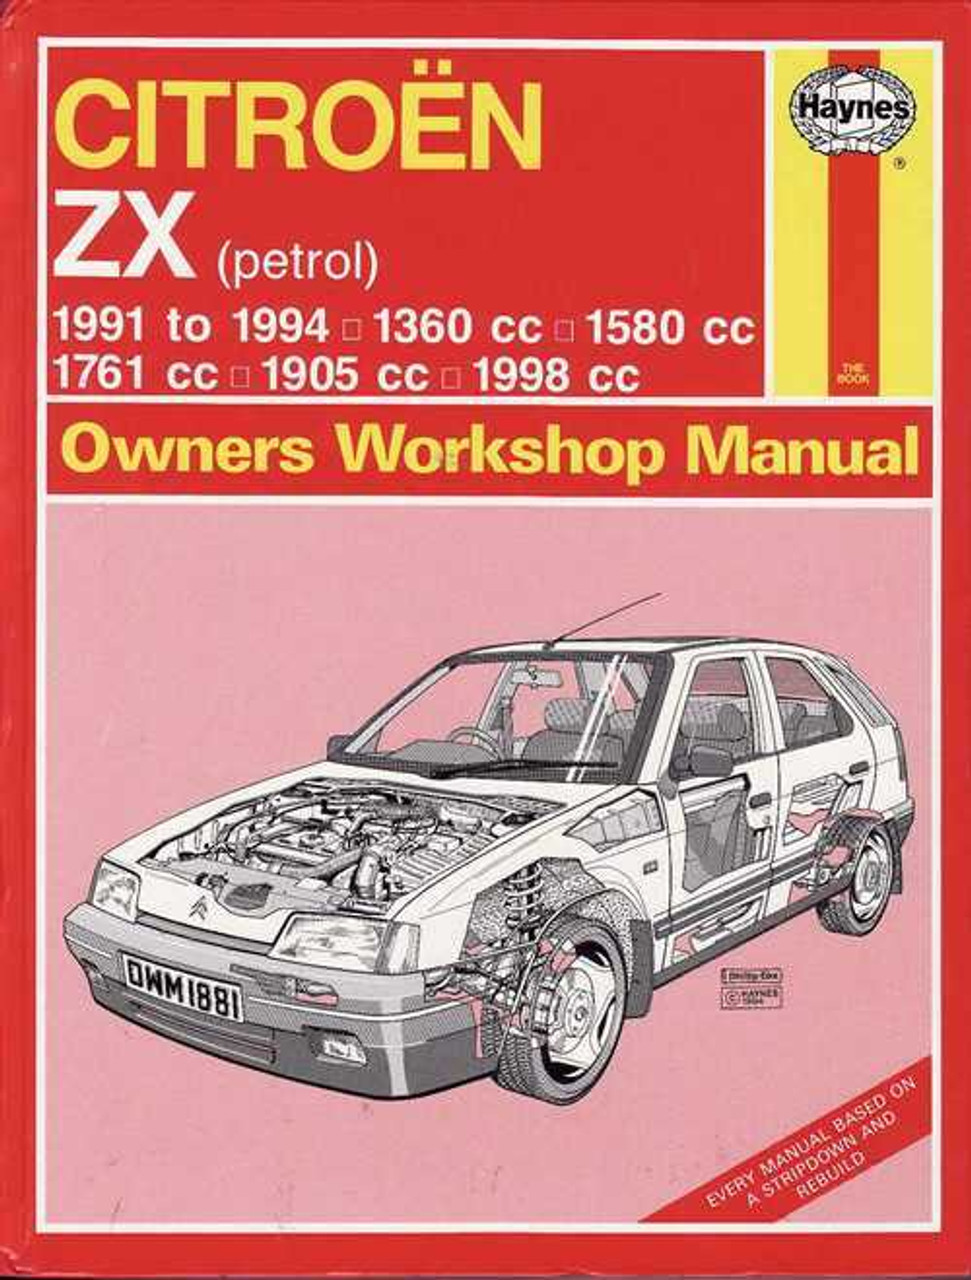 citroen zx petrol 1991 1994 workshop manual rh automotobookshop com au Citroen DS3 citroen zx service manual pdf